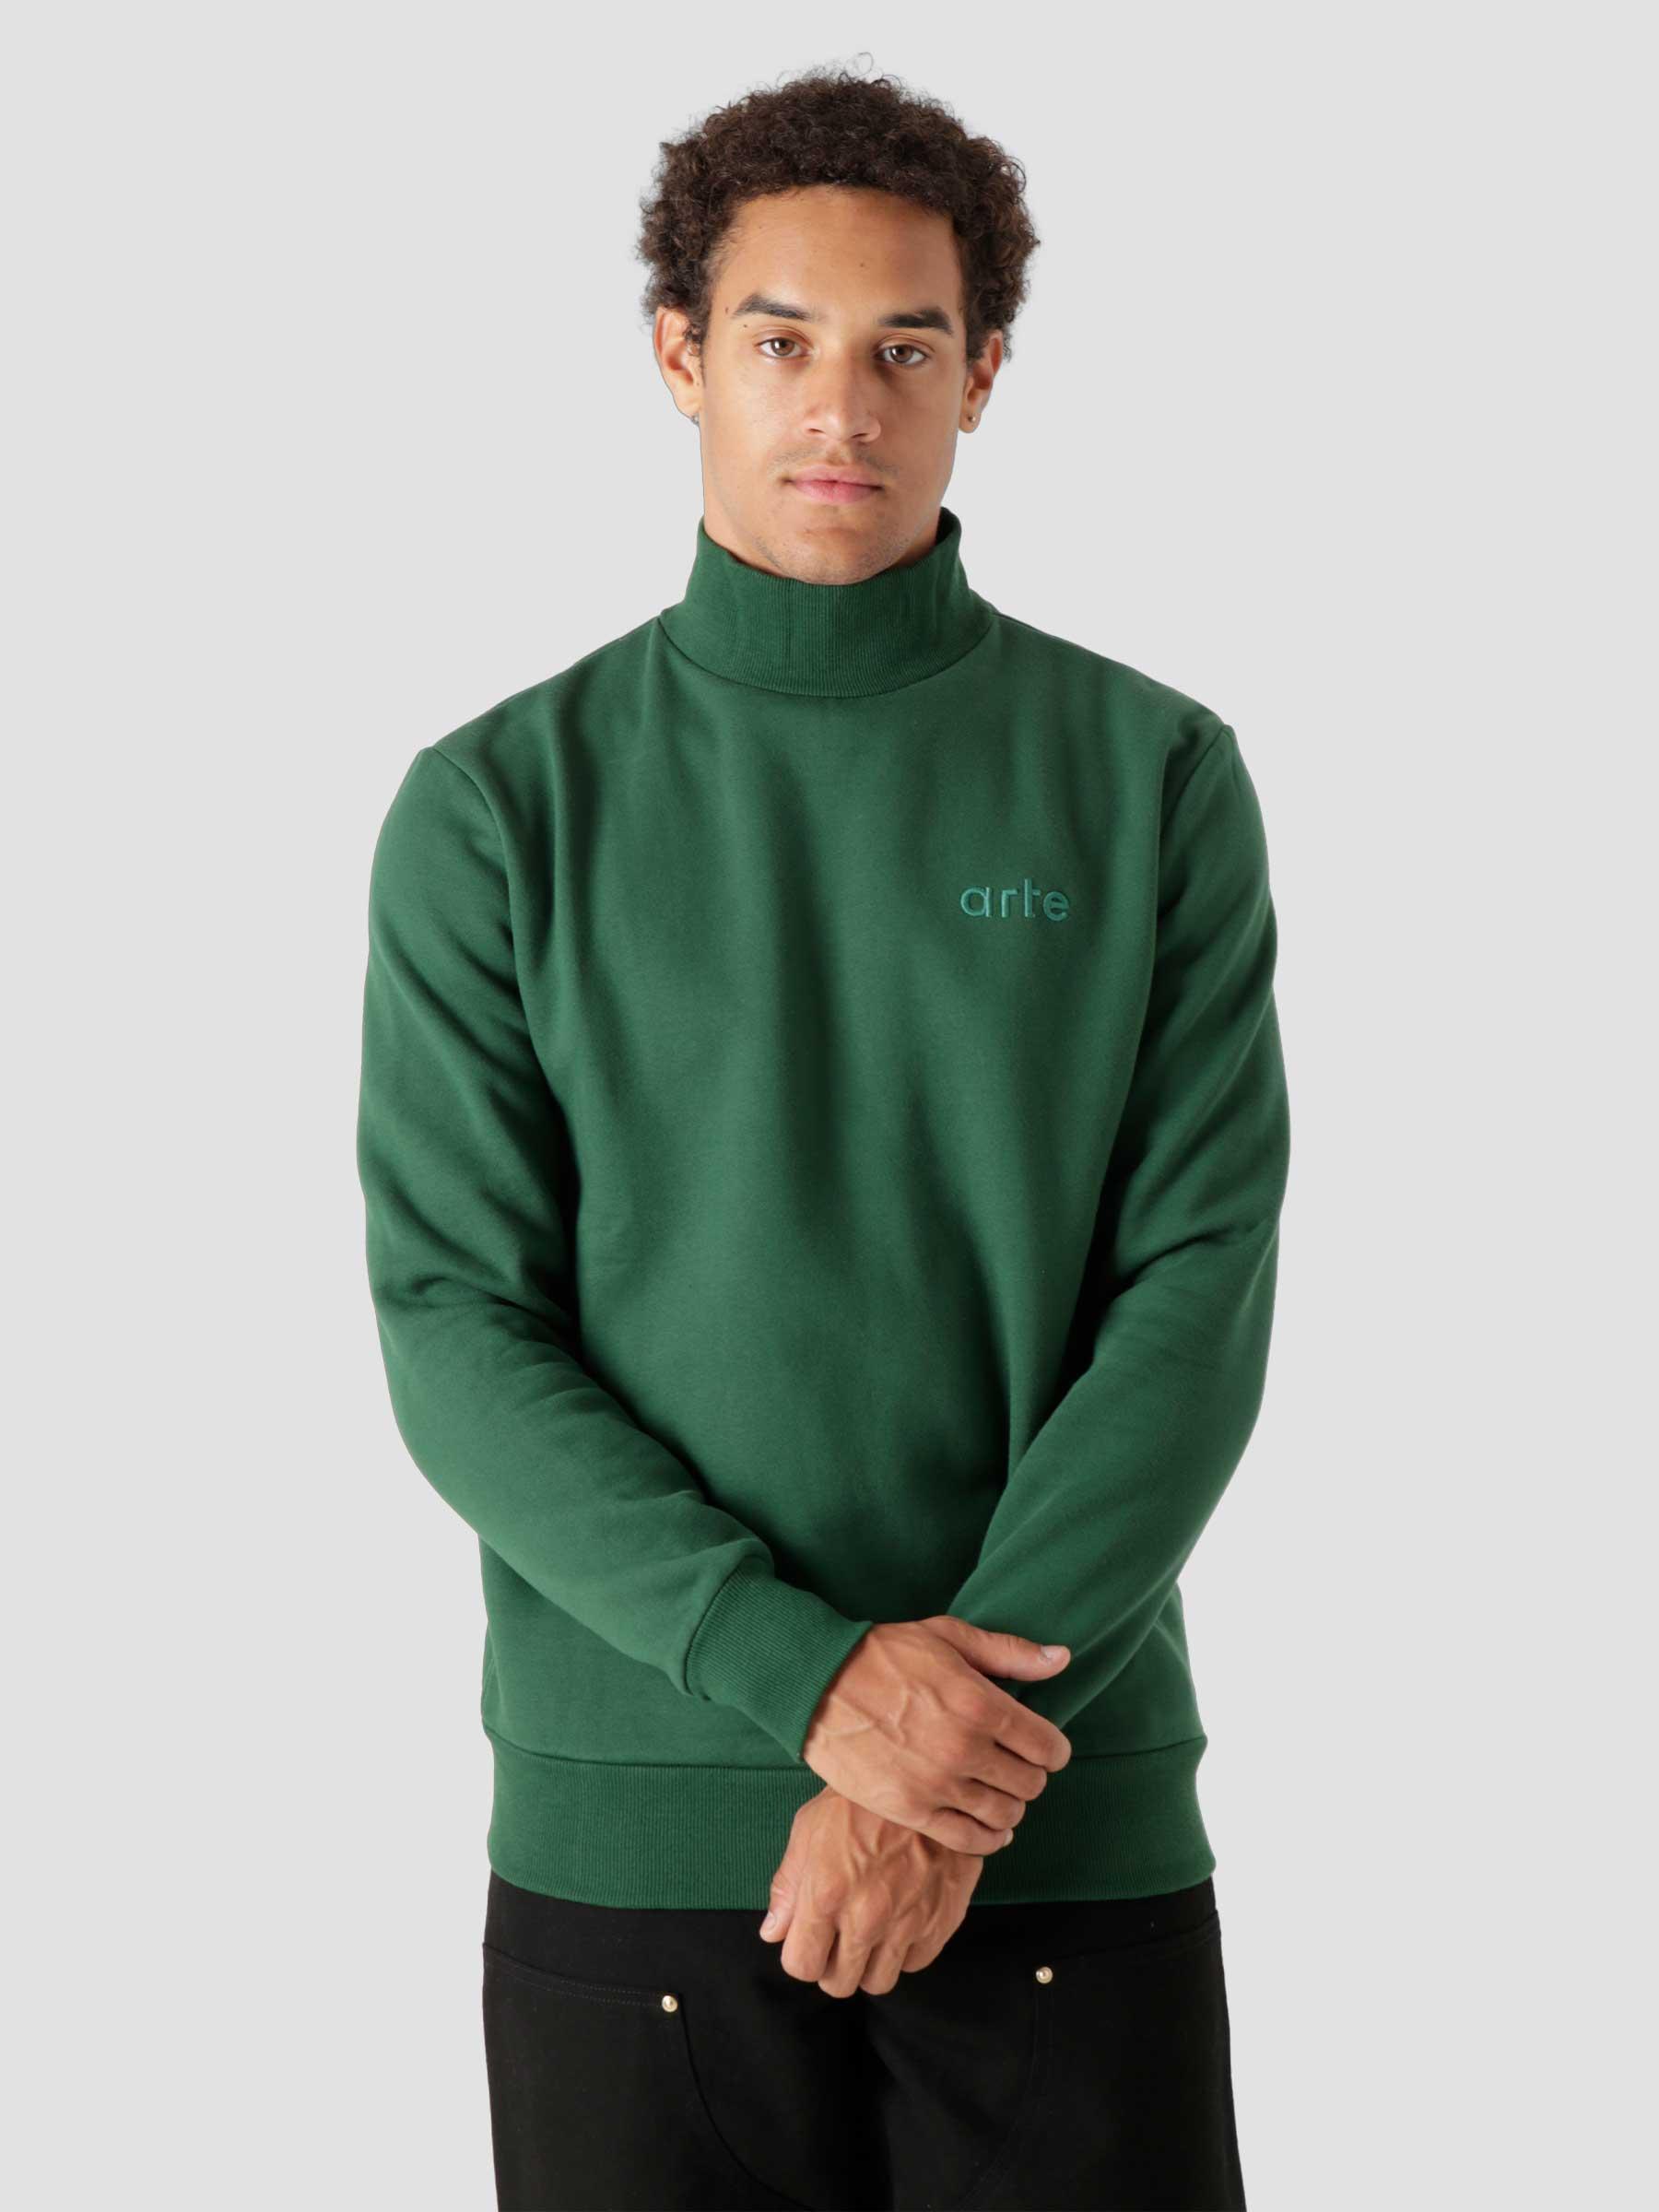 Carter Sweater Green AW21-127C